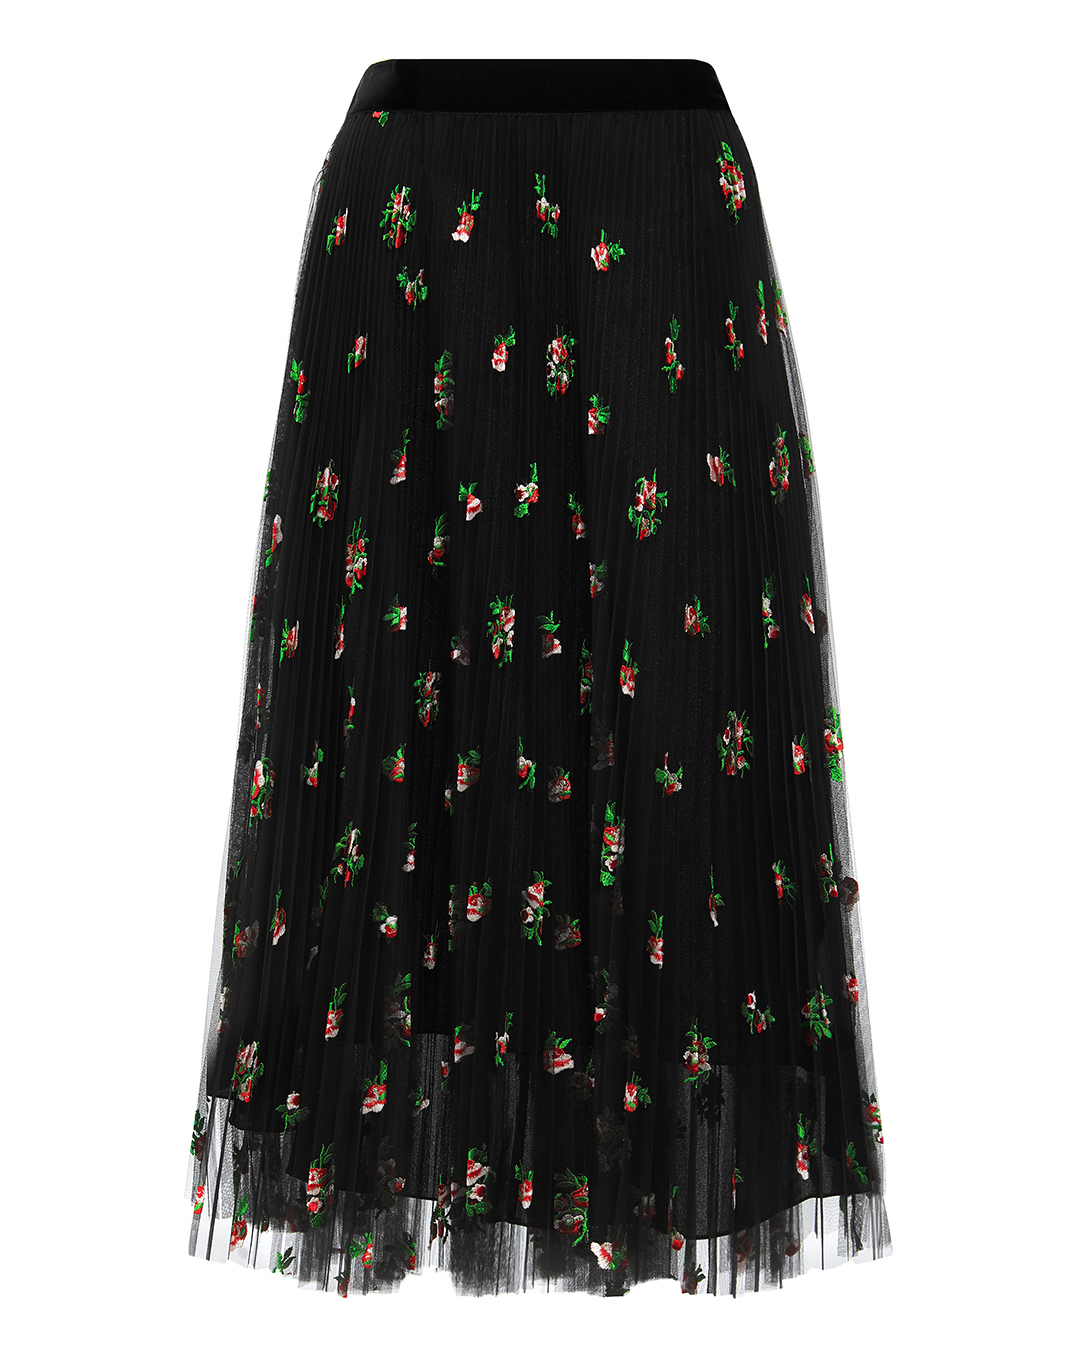 PHILOSOPHY DI L.SERAFINI Floral Tulle Skirt